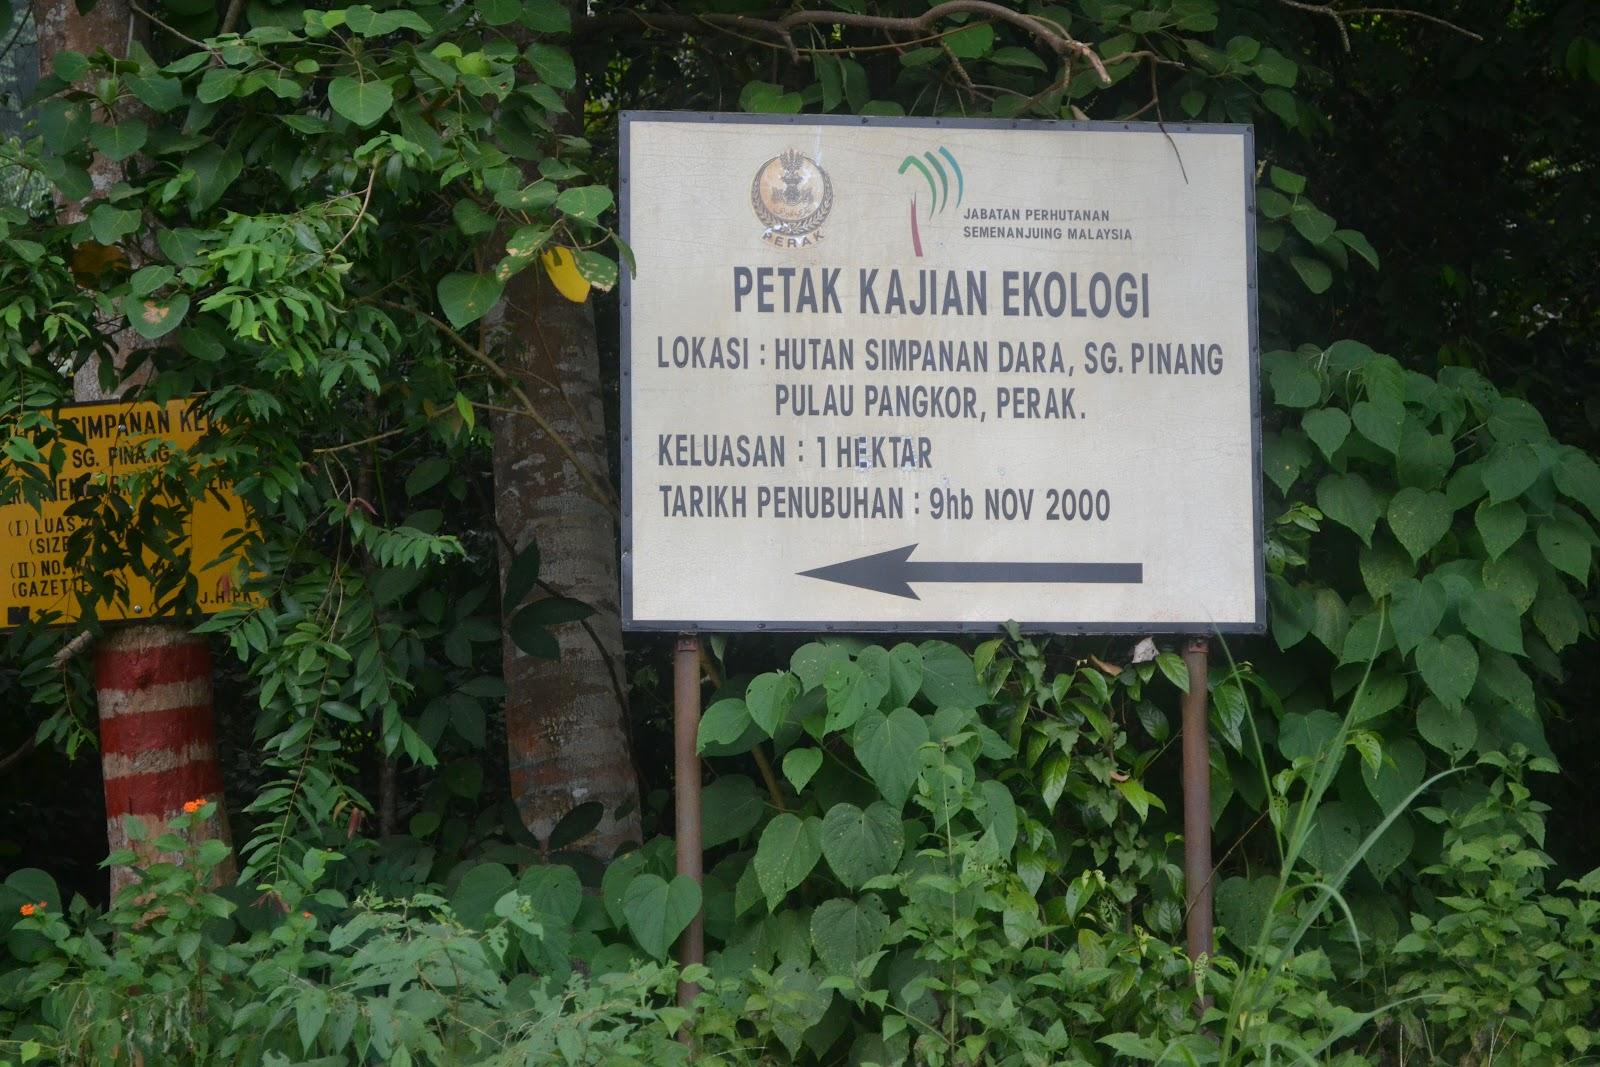 how to go pulau pangkor